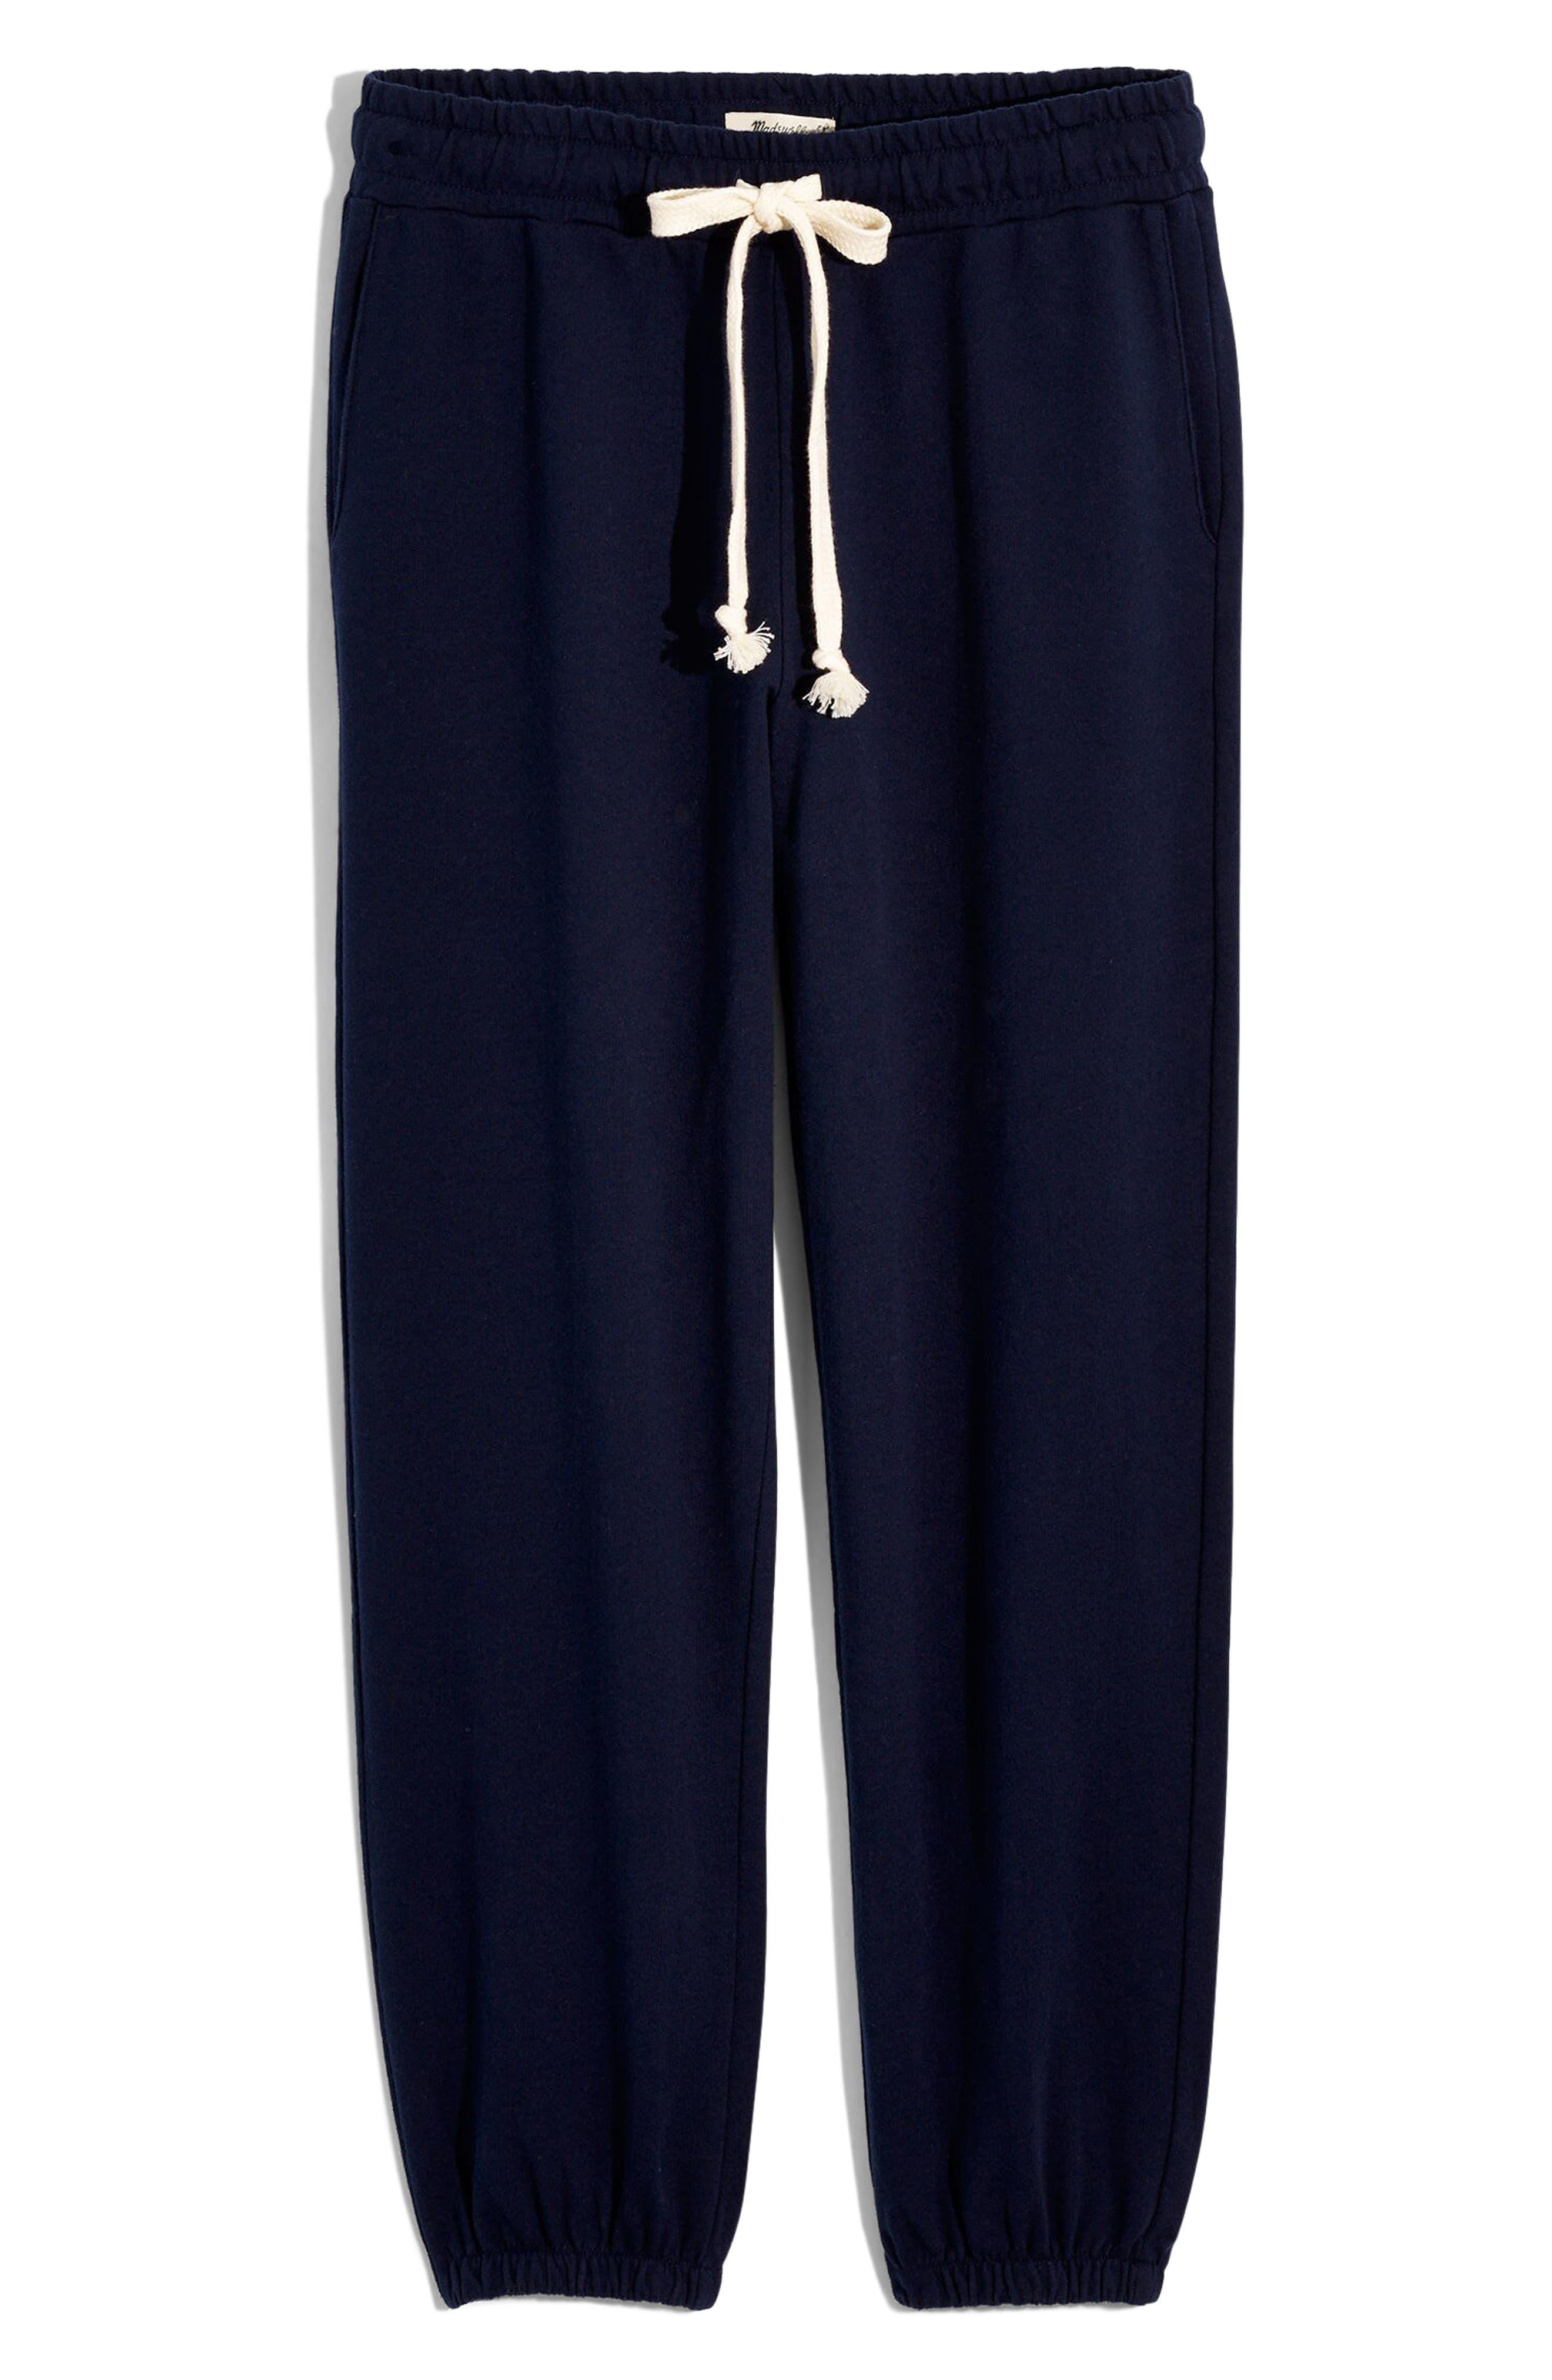 Women's Madewell Trouser Sweatpants